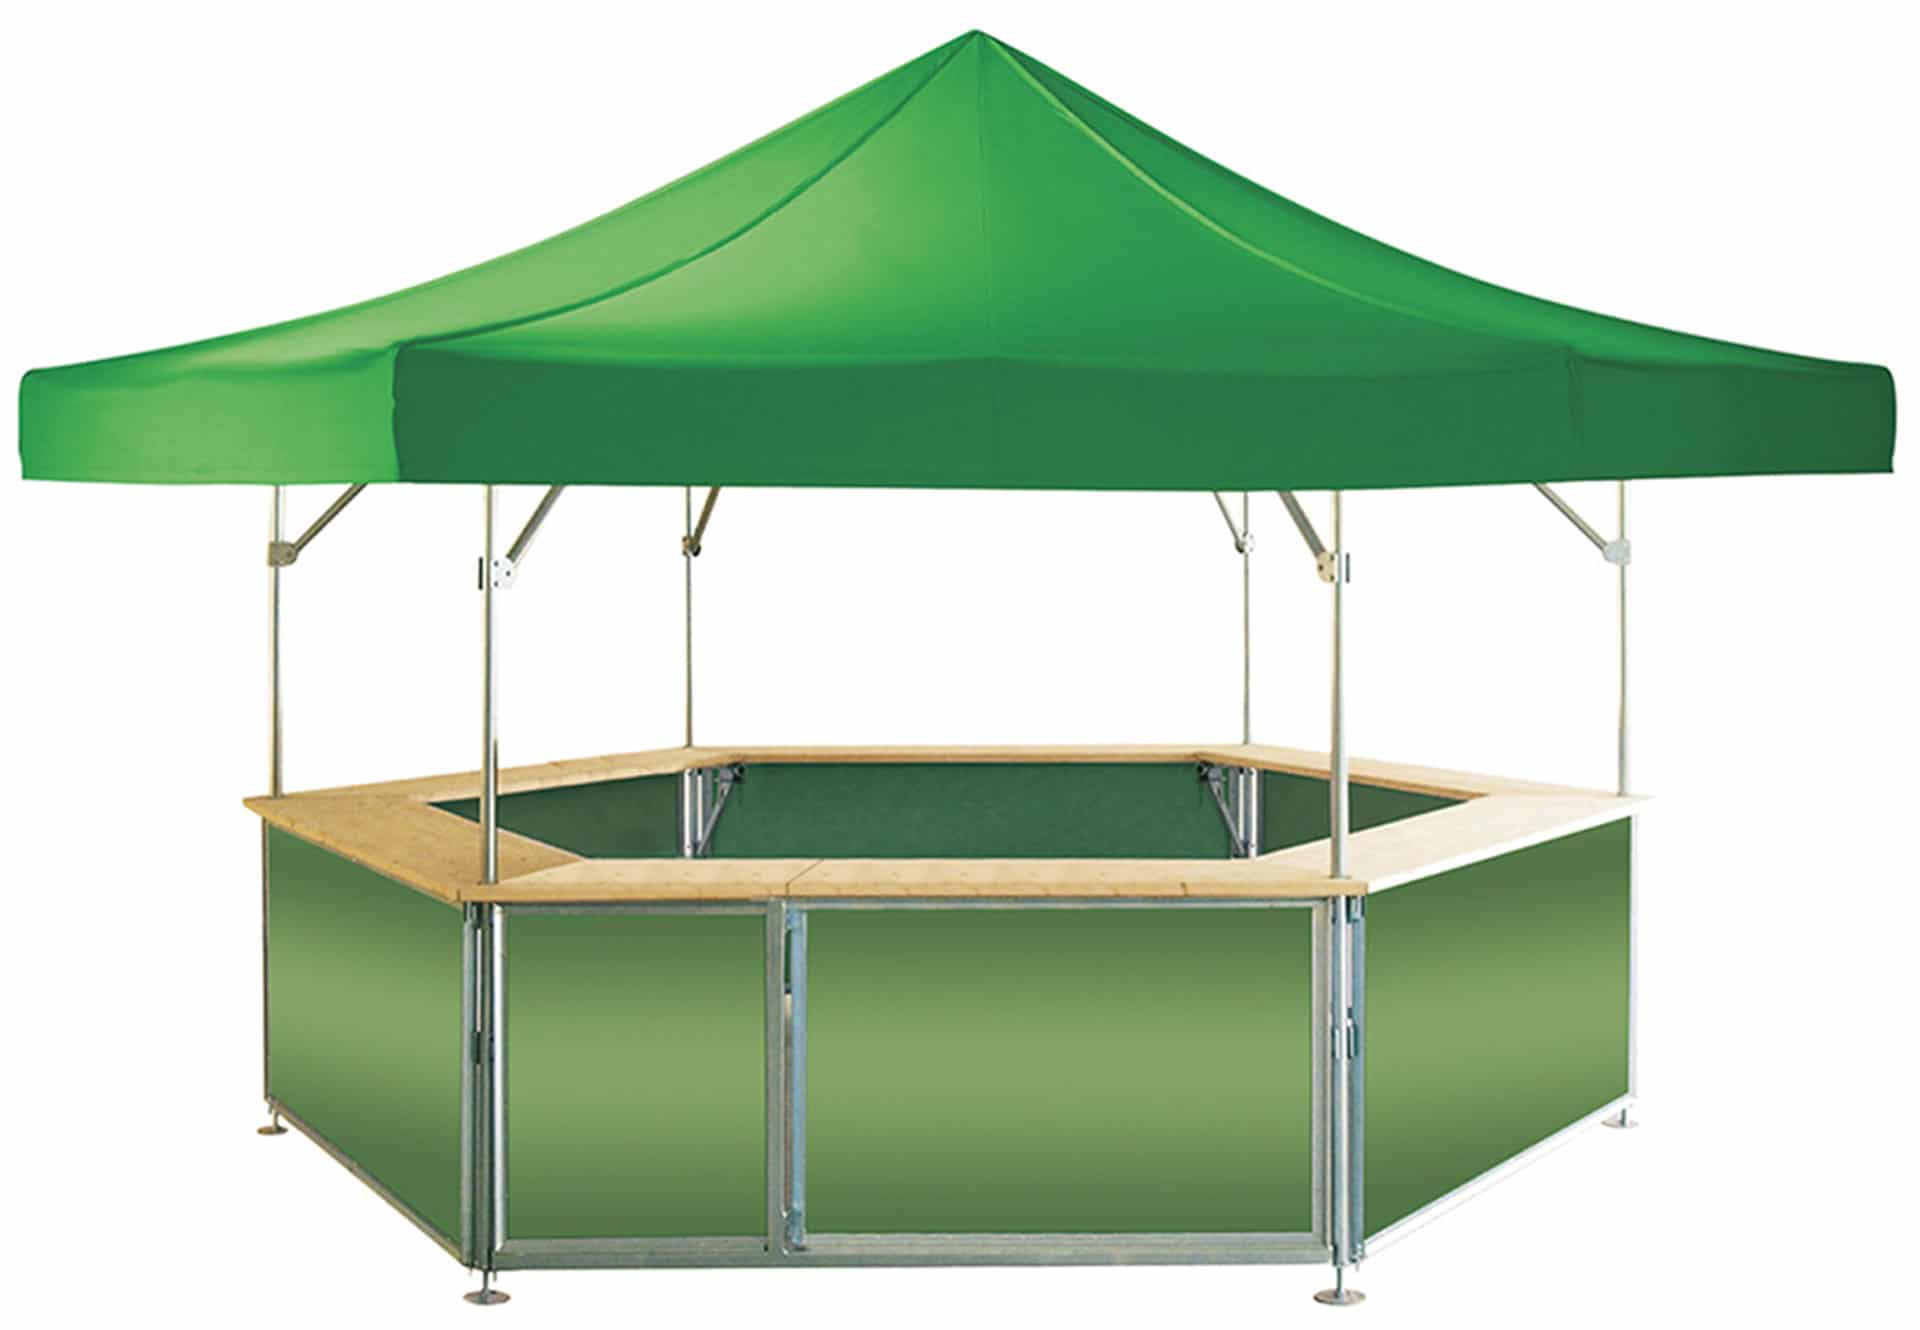 Pavillon Robust Set : Pavillon kiosk qualytent Überdachungssysteme zubehör